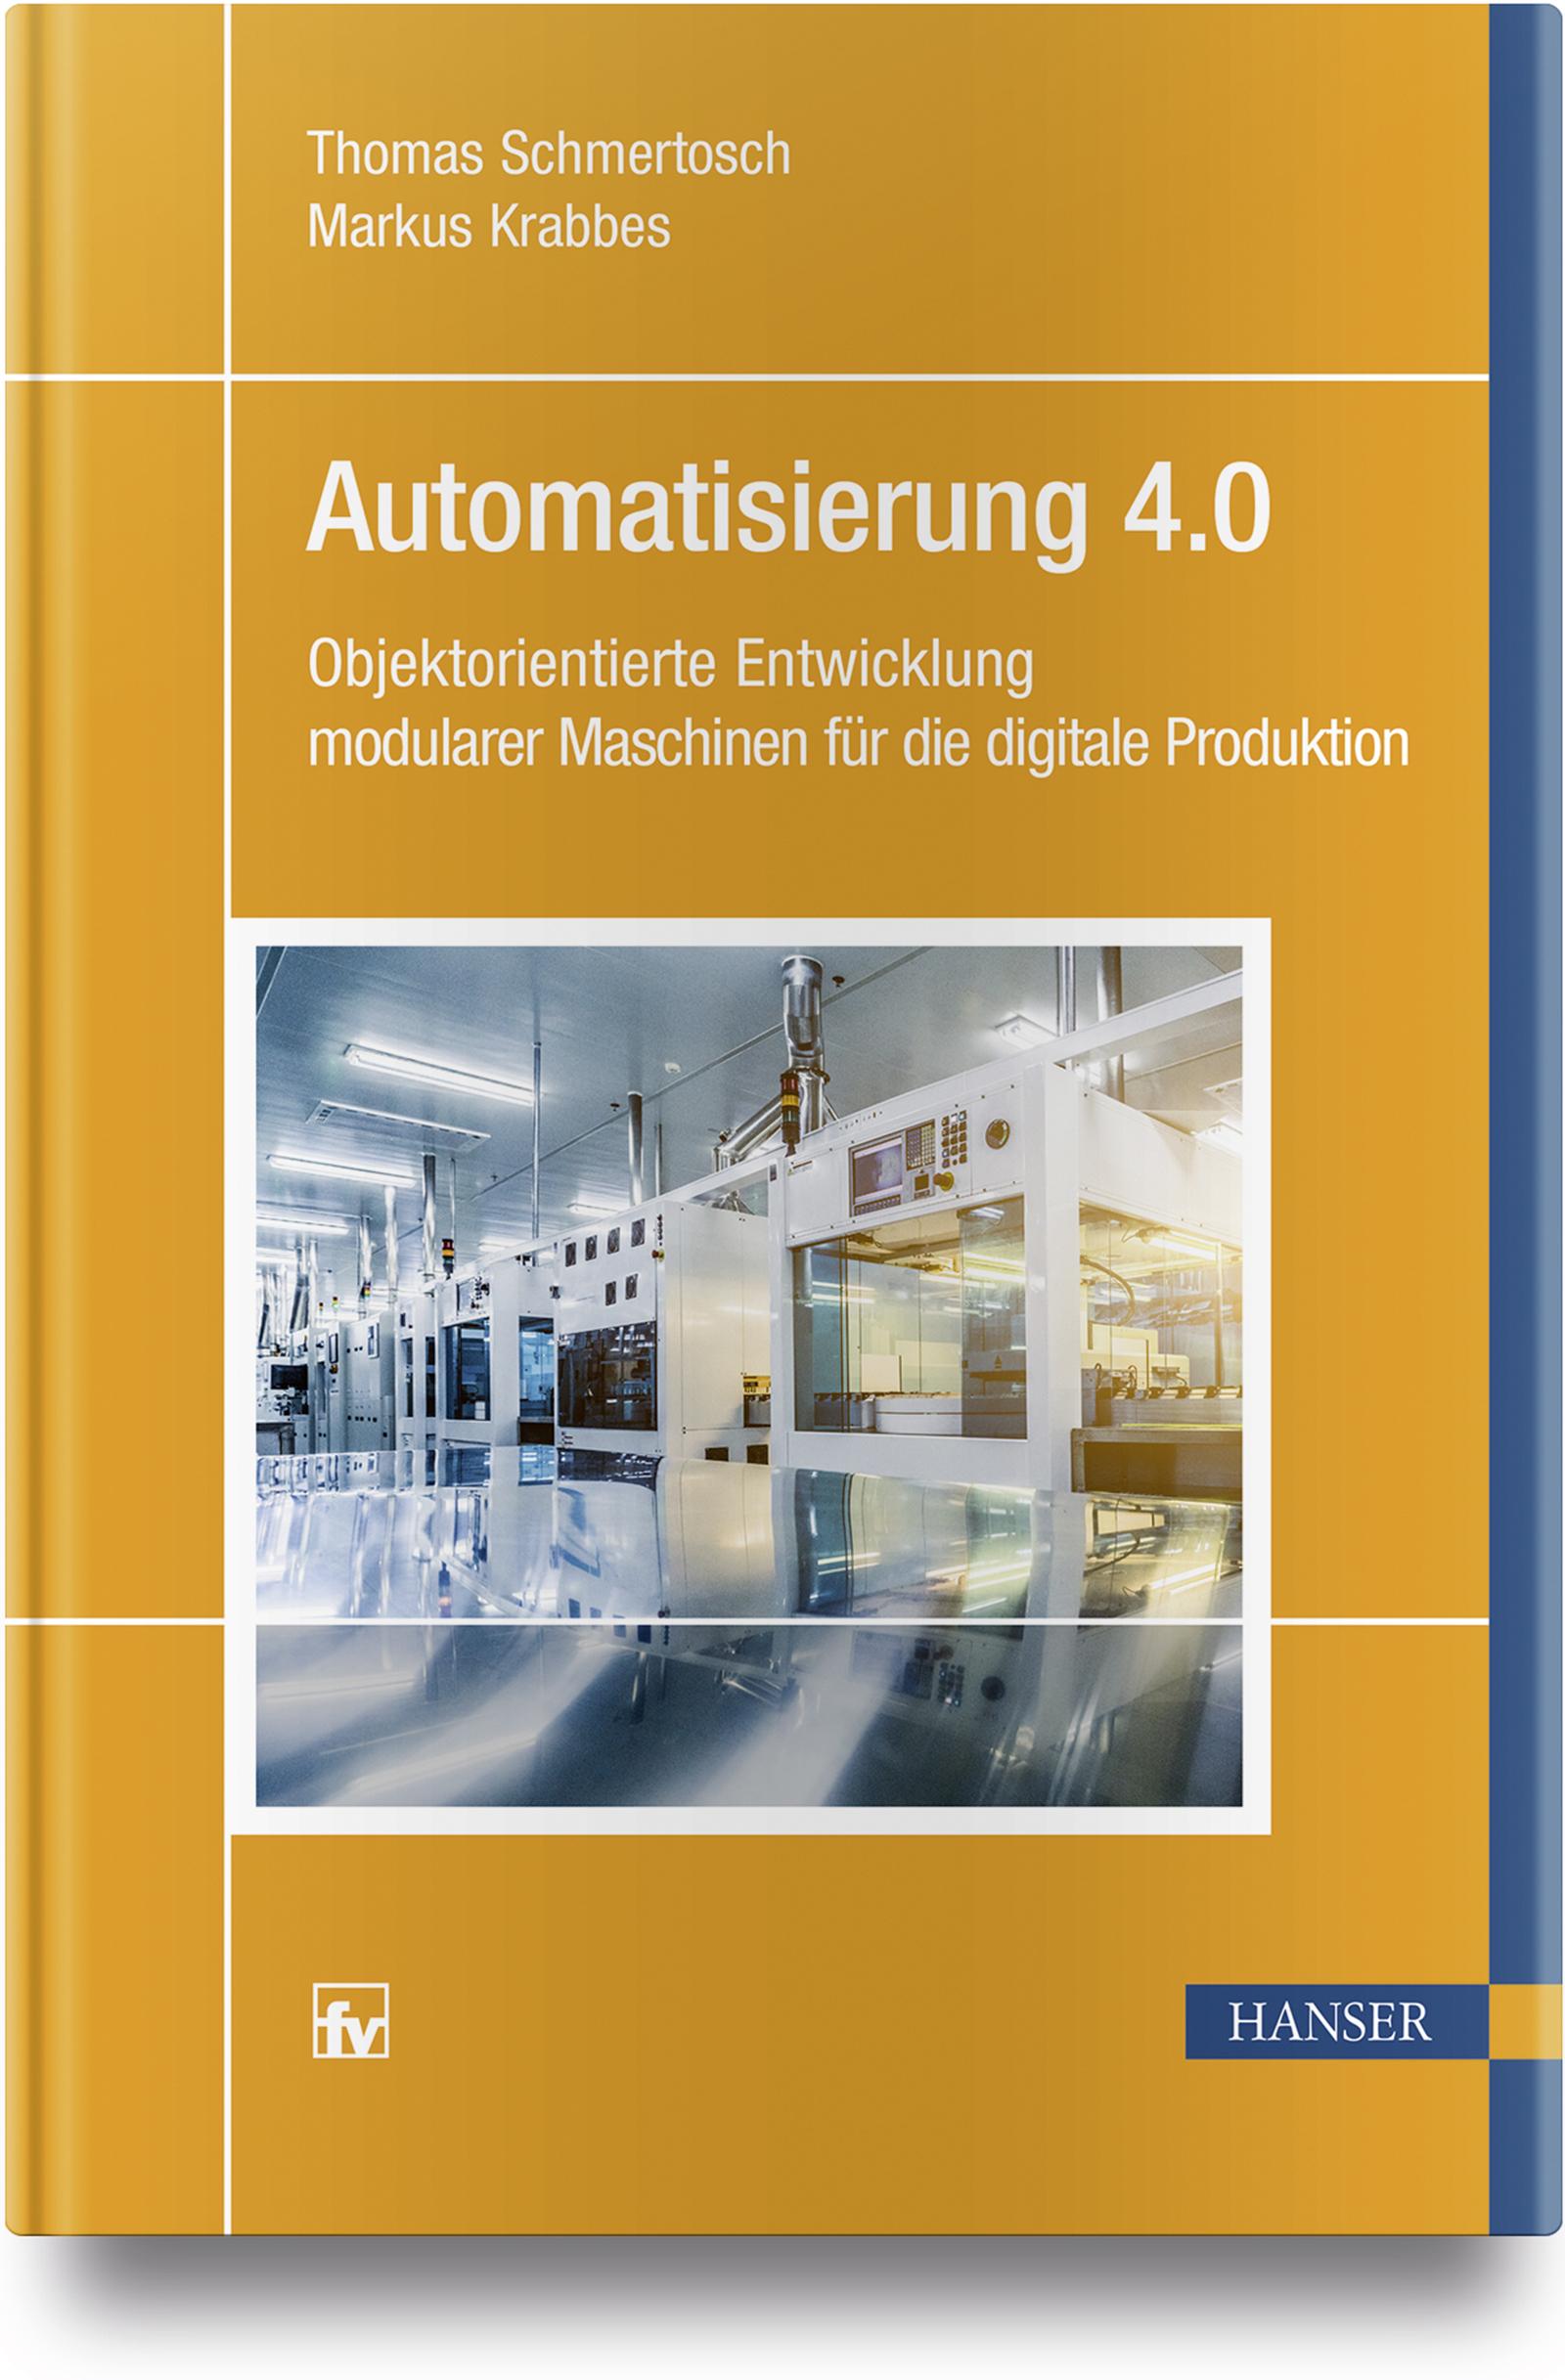 Schmertosch, Krabbes, Automatisierung 4.0, 978-3-446-45220-6